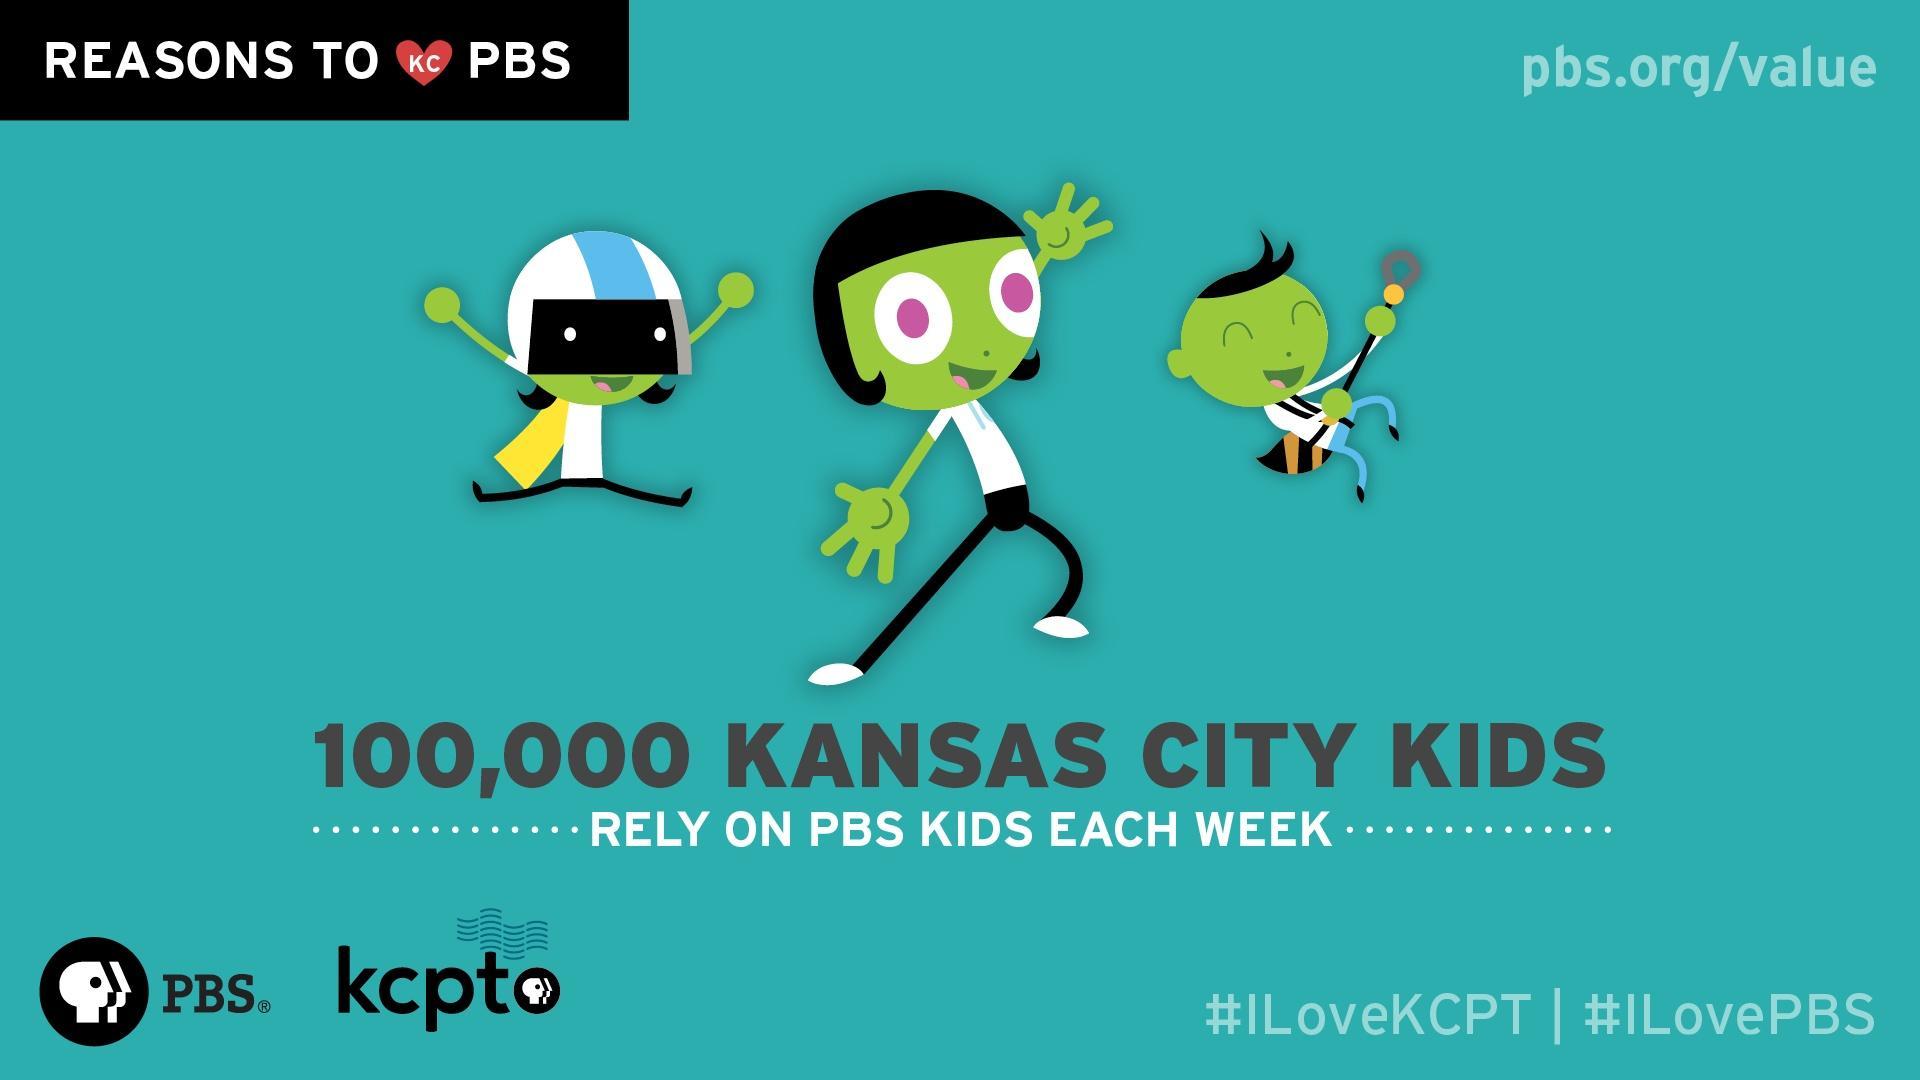 100,000 Kansas City kids rely on PBS KIDS each week.